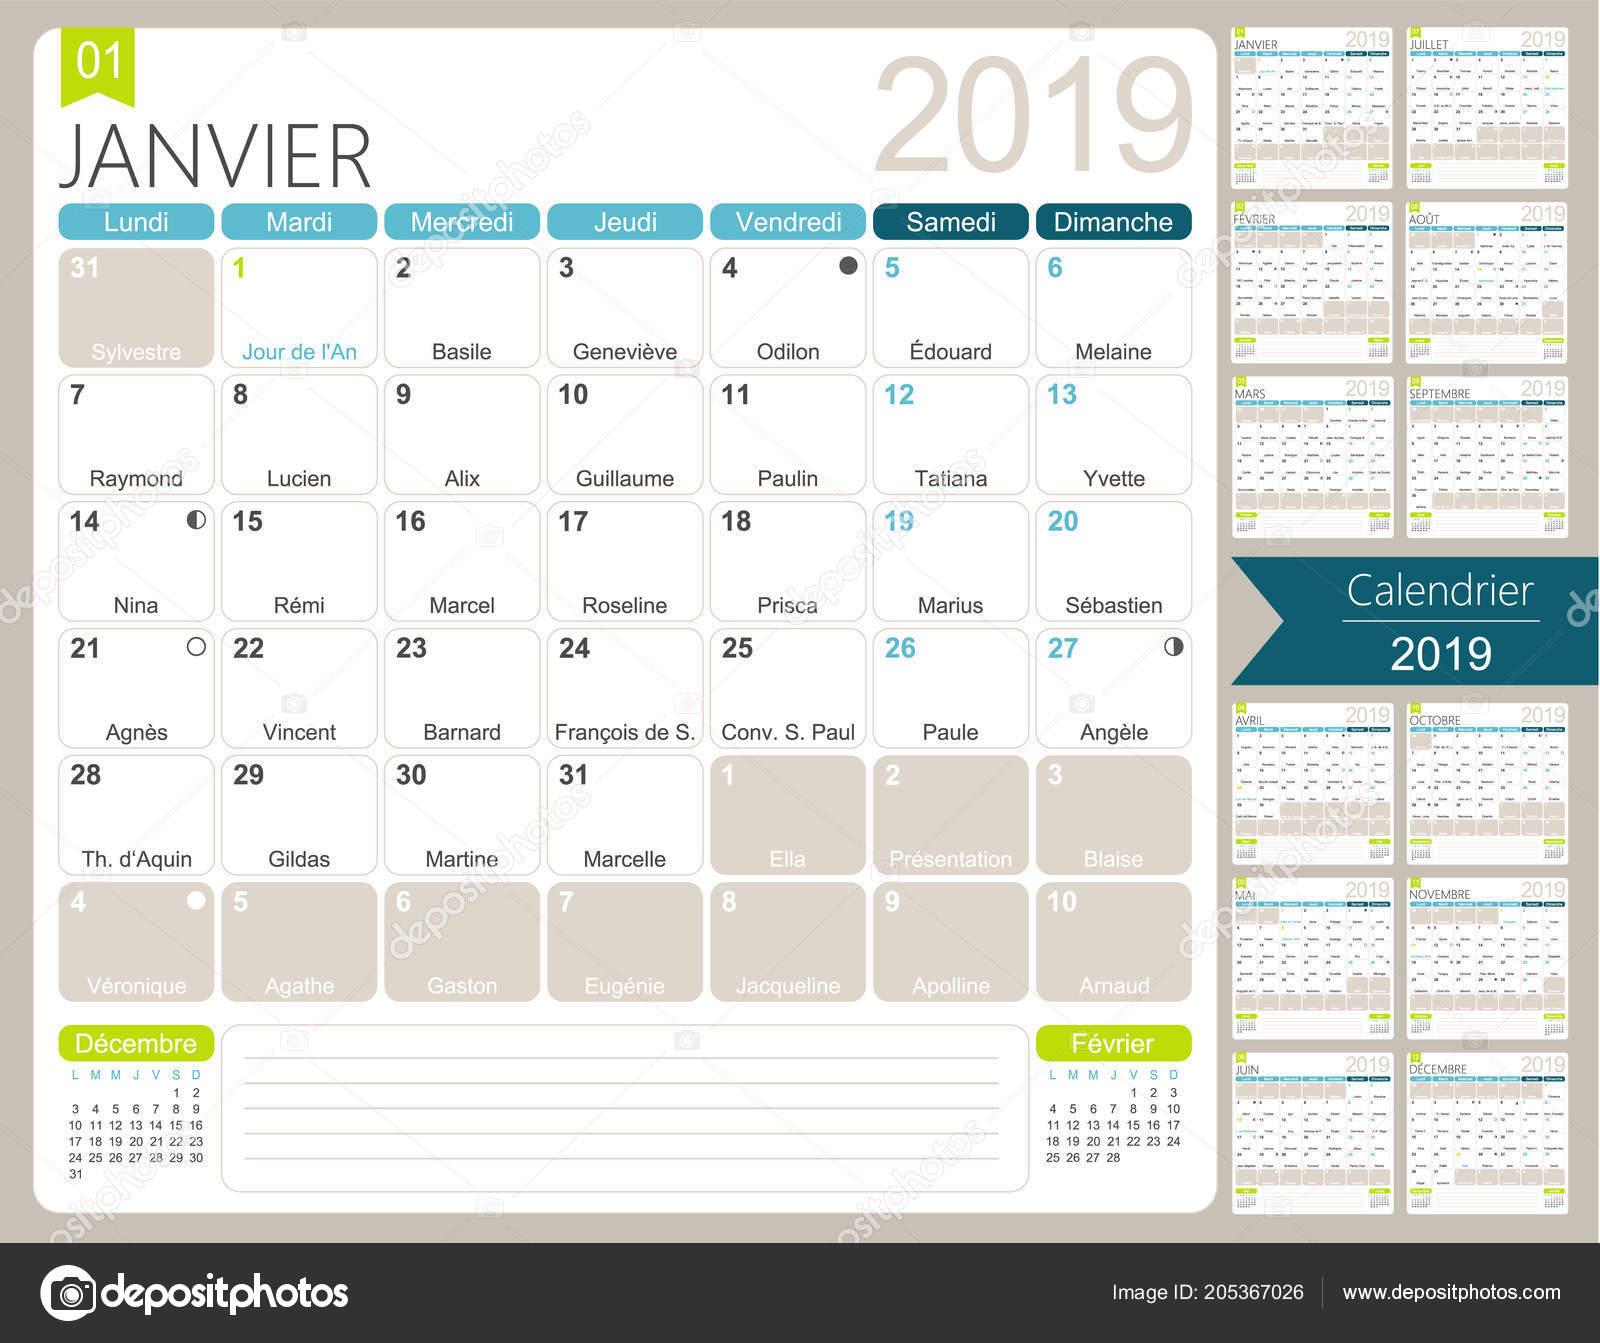 January 2019 Calendar Name French Calendar 2019 Calendar 2019 Set Months January December